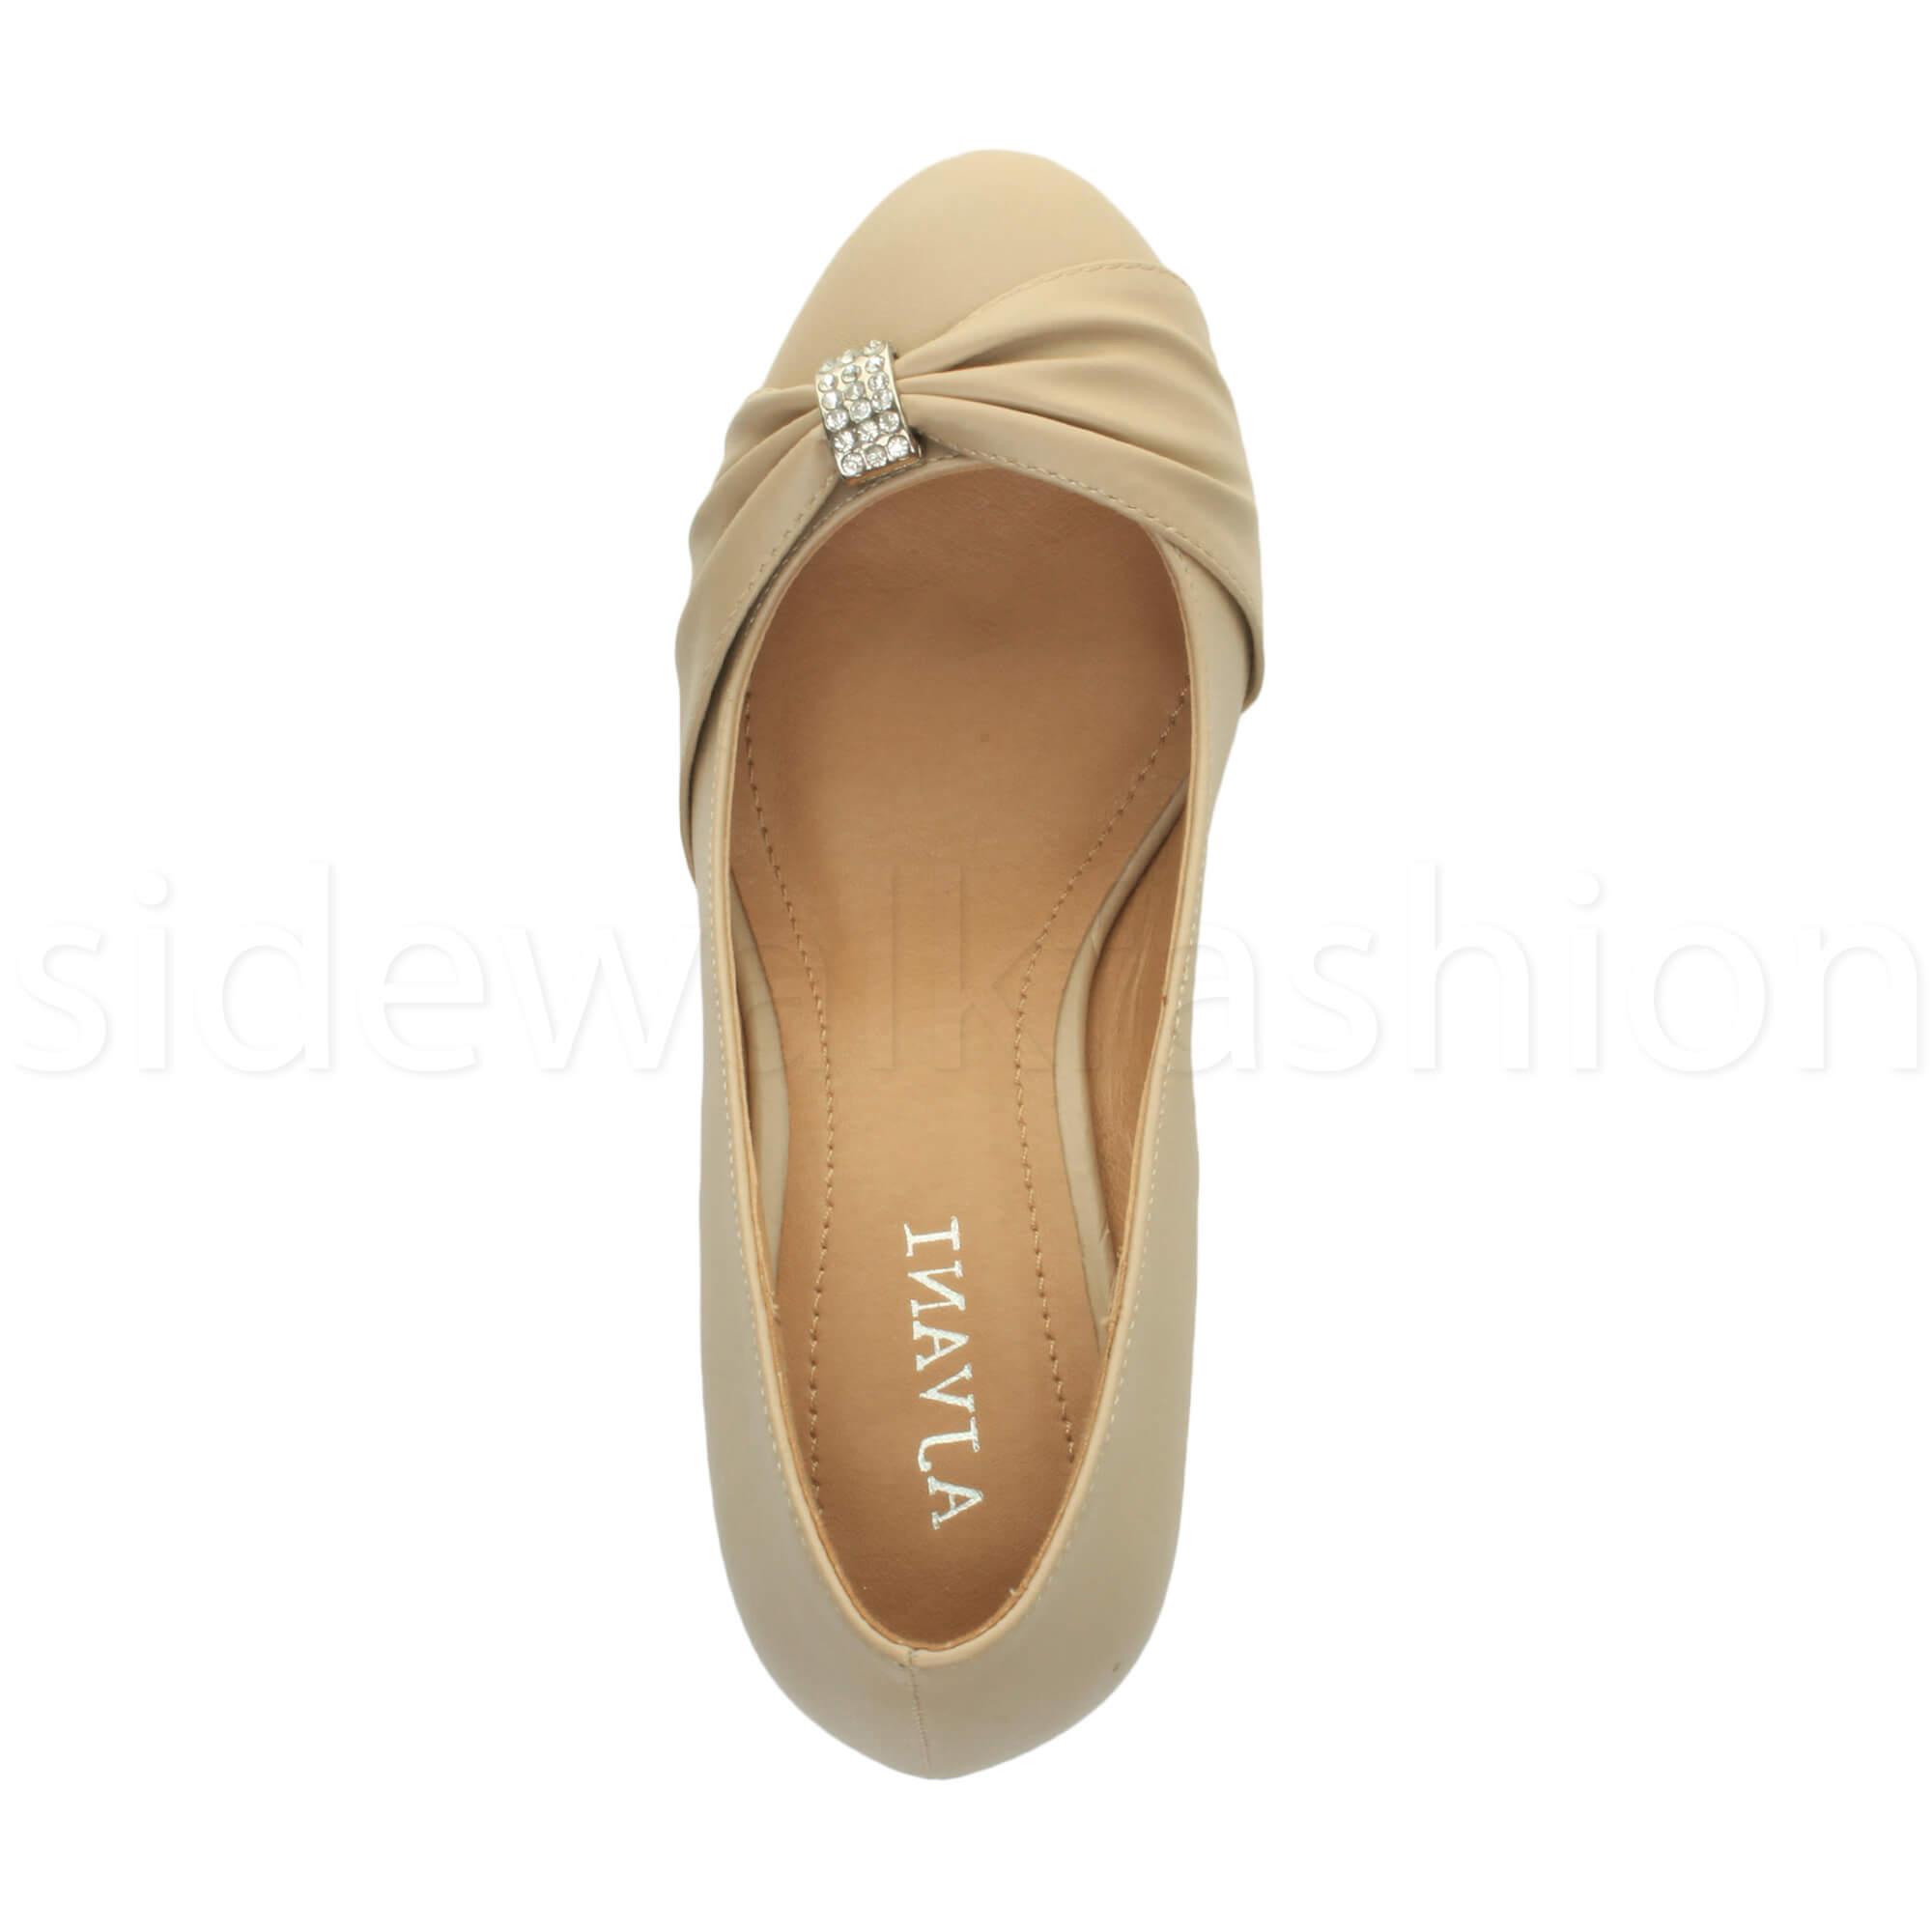 Womens-ladies-low-mid-heel-diamante-party-smart-evening-court-shoes-size thumbnail 64